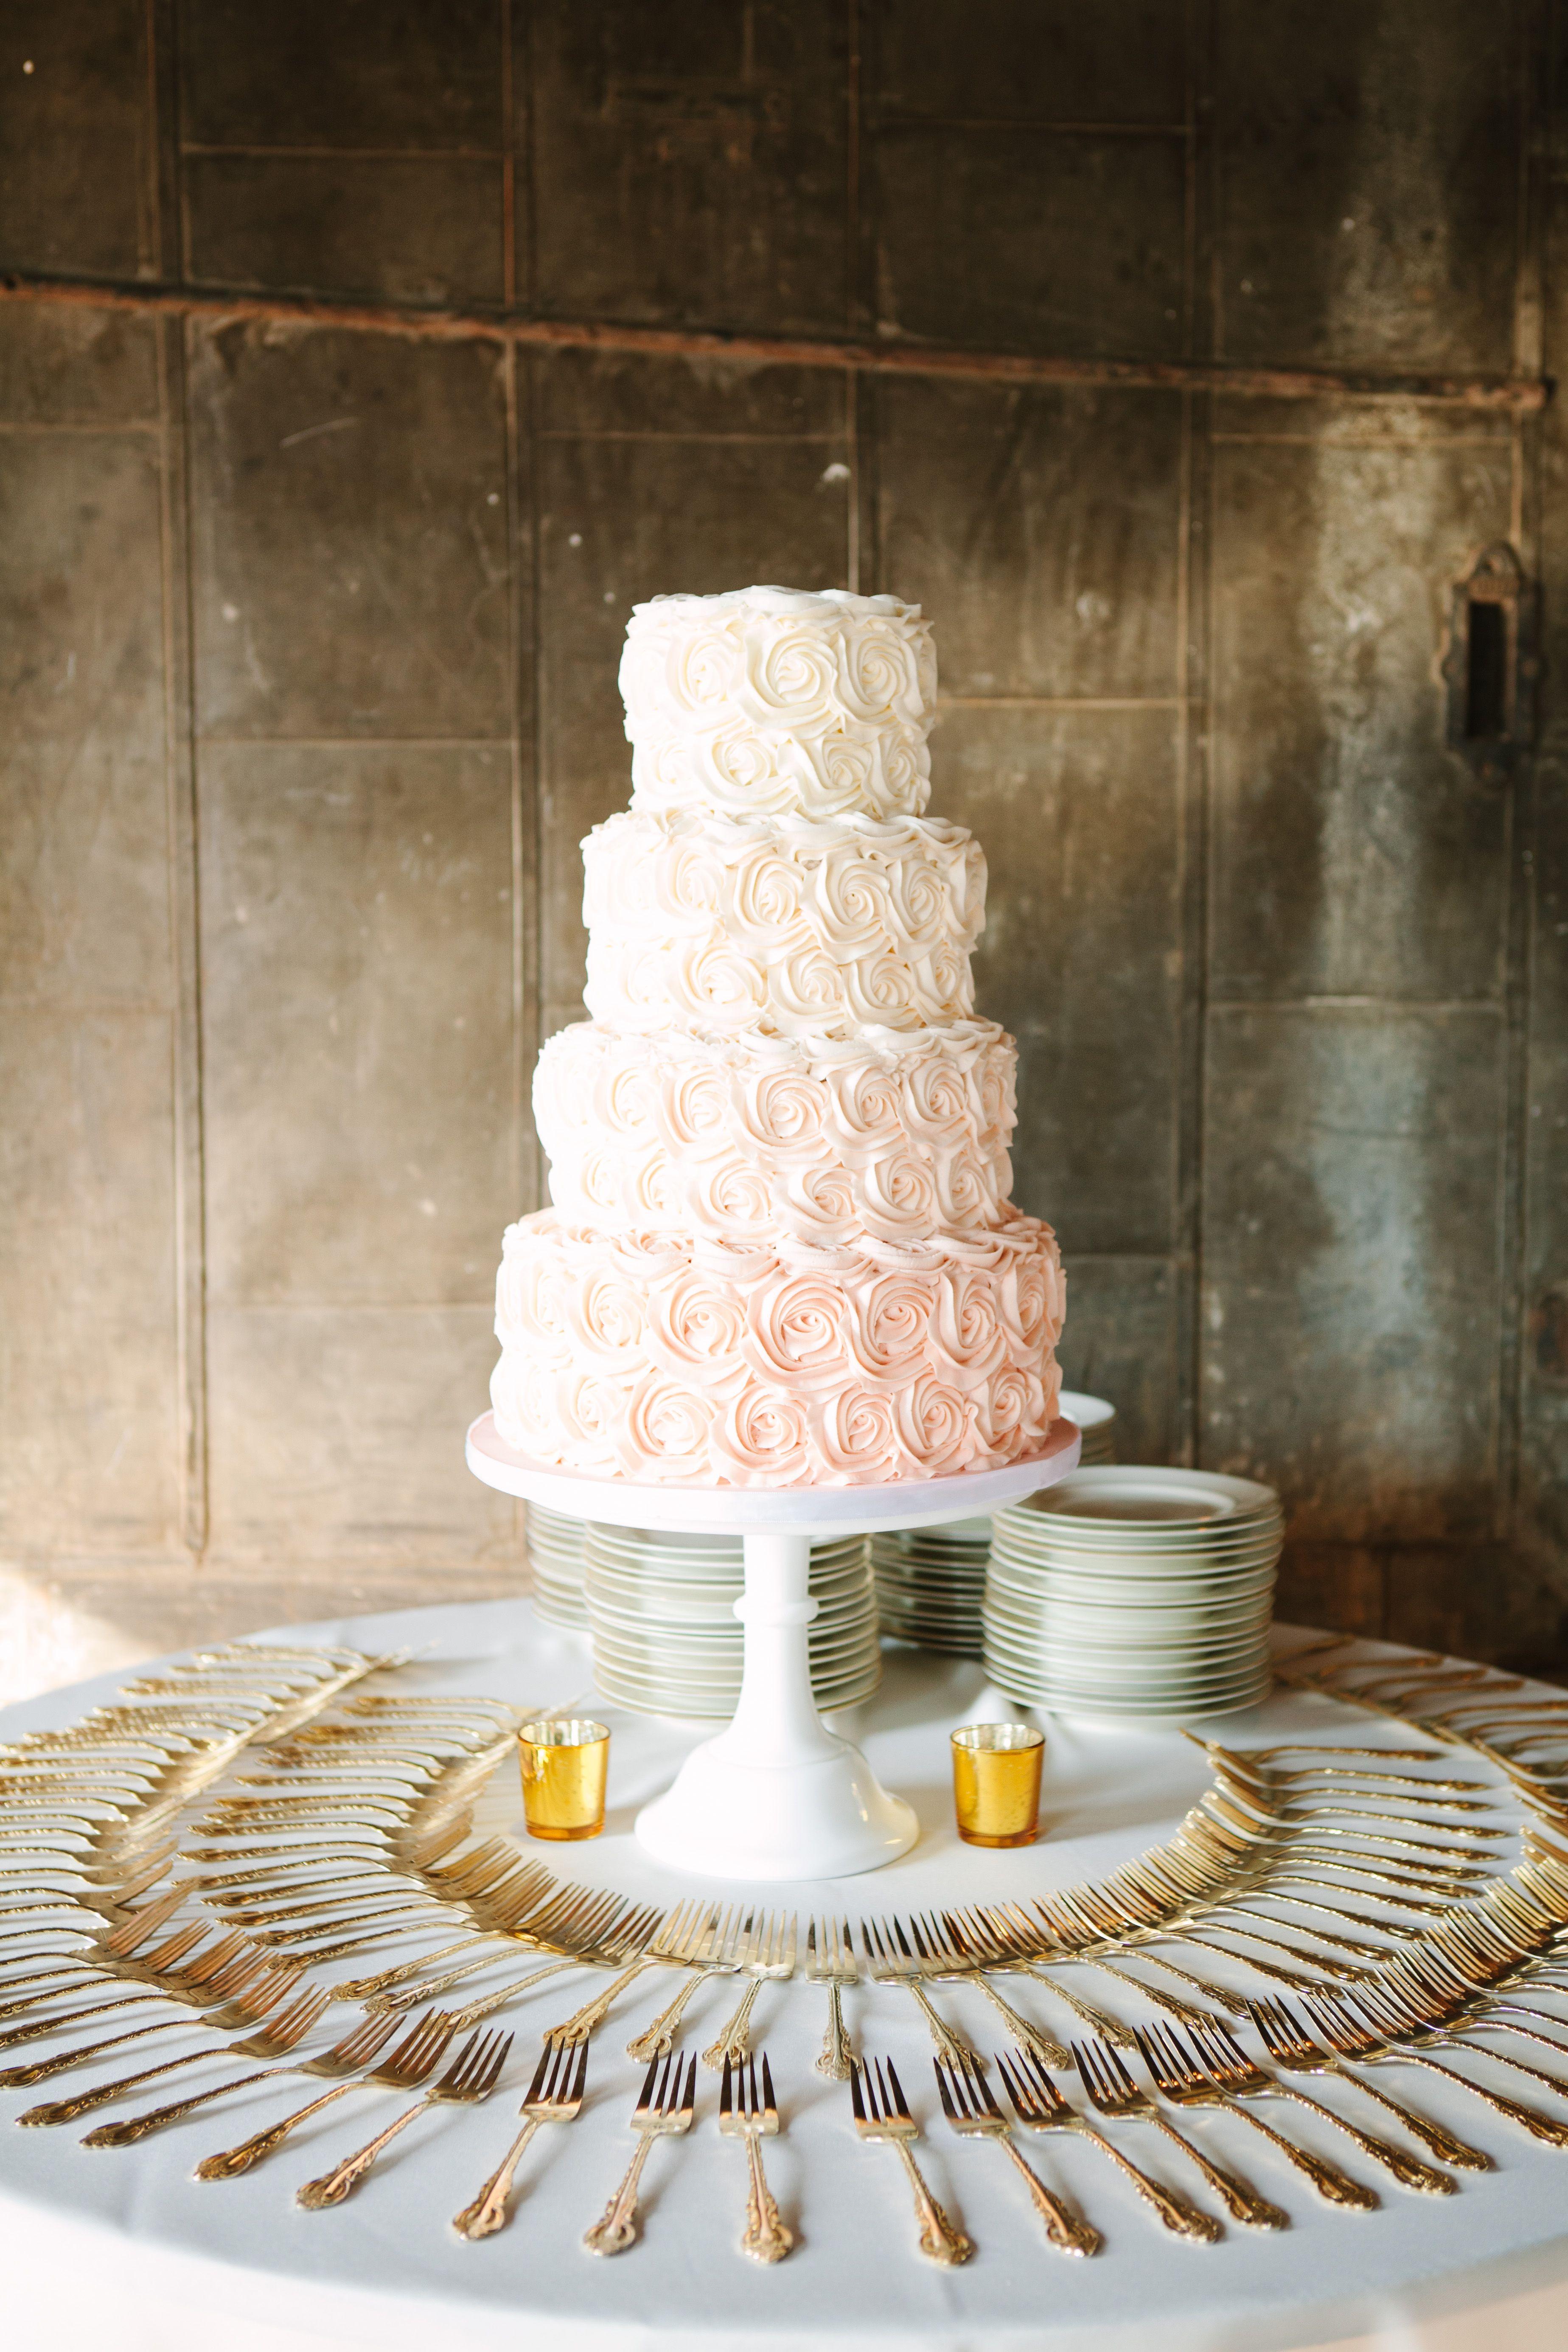 Ombre blush pink rosettes buttercream wedding cake nashvillesweets